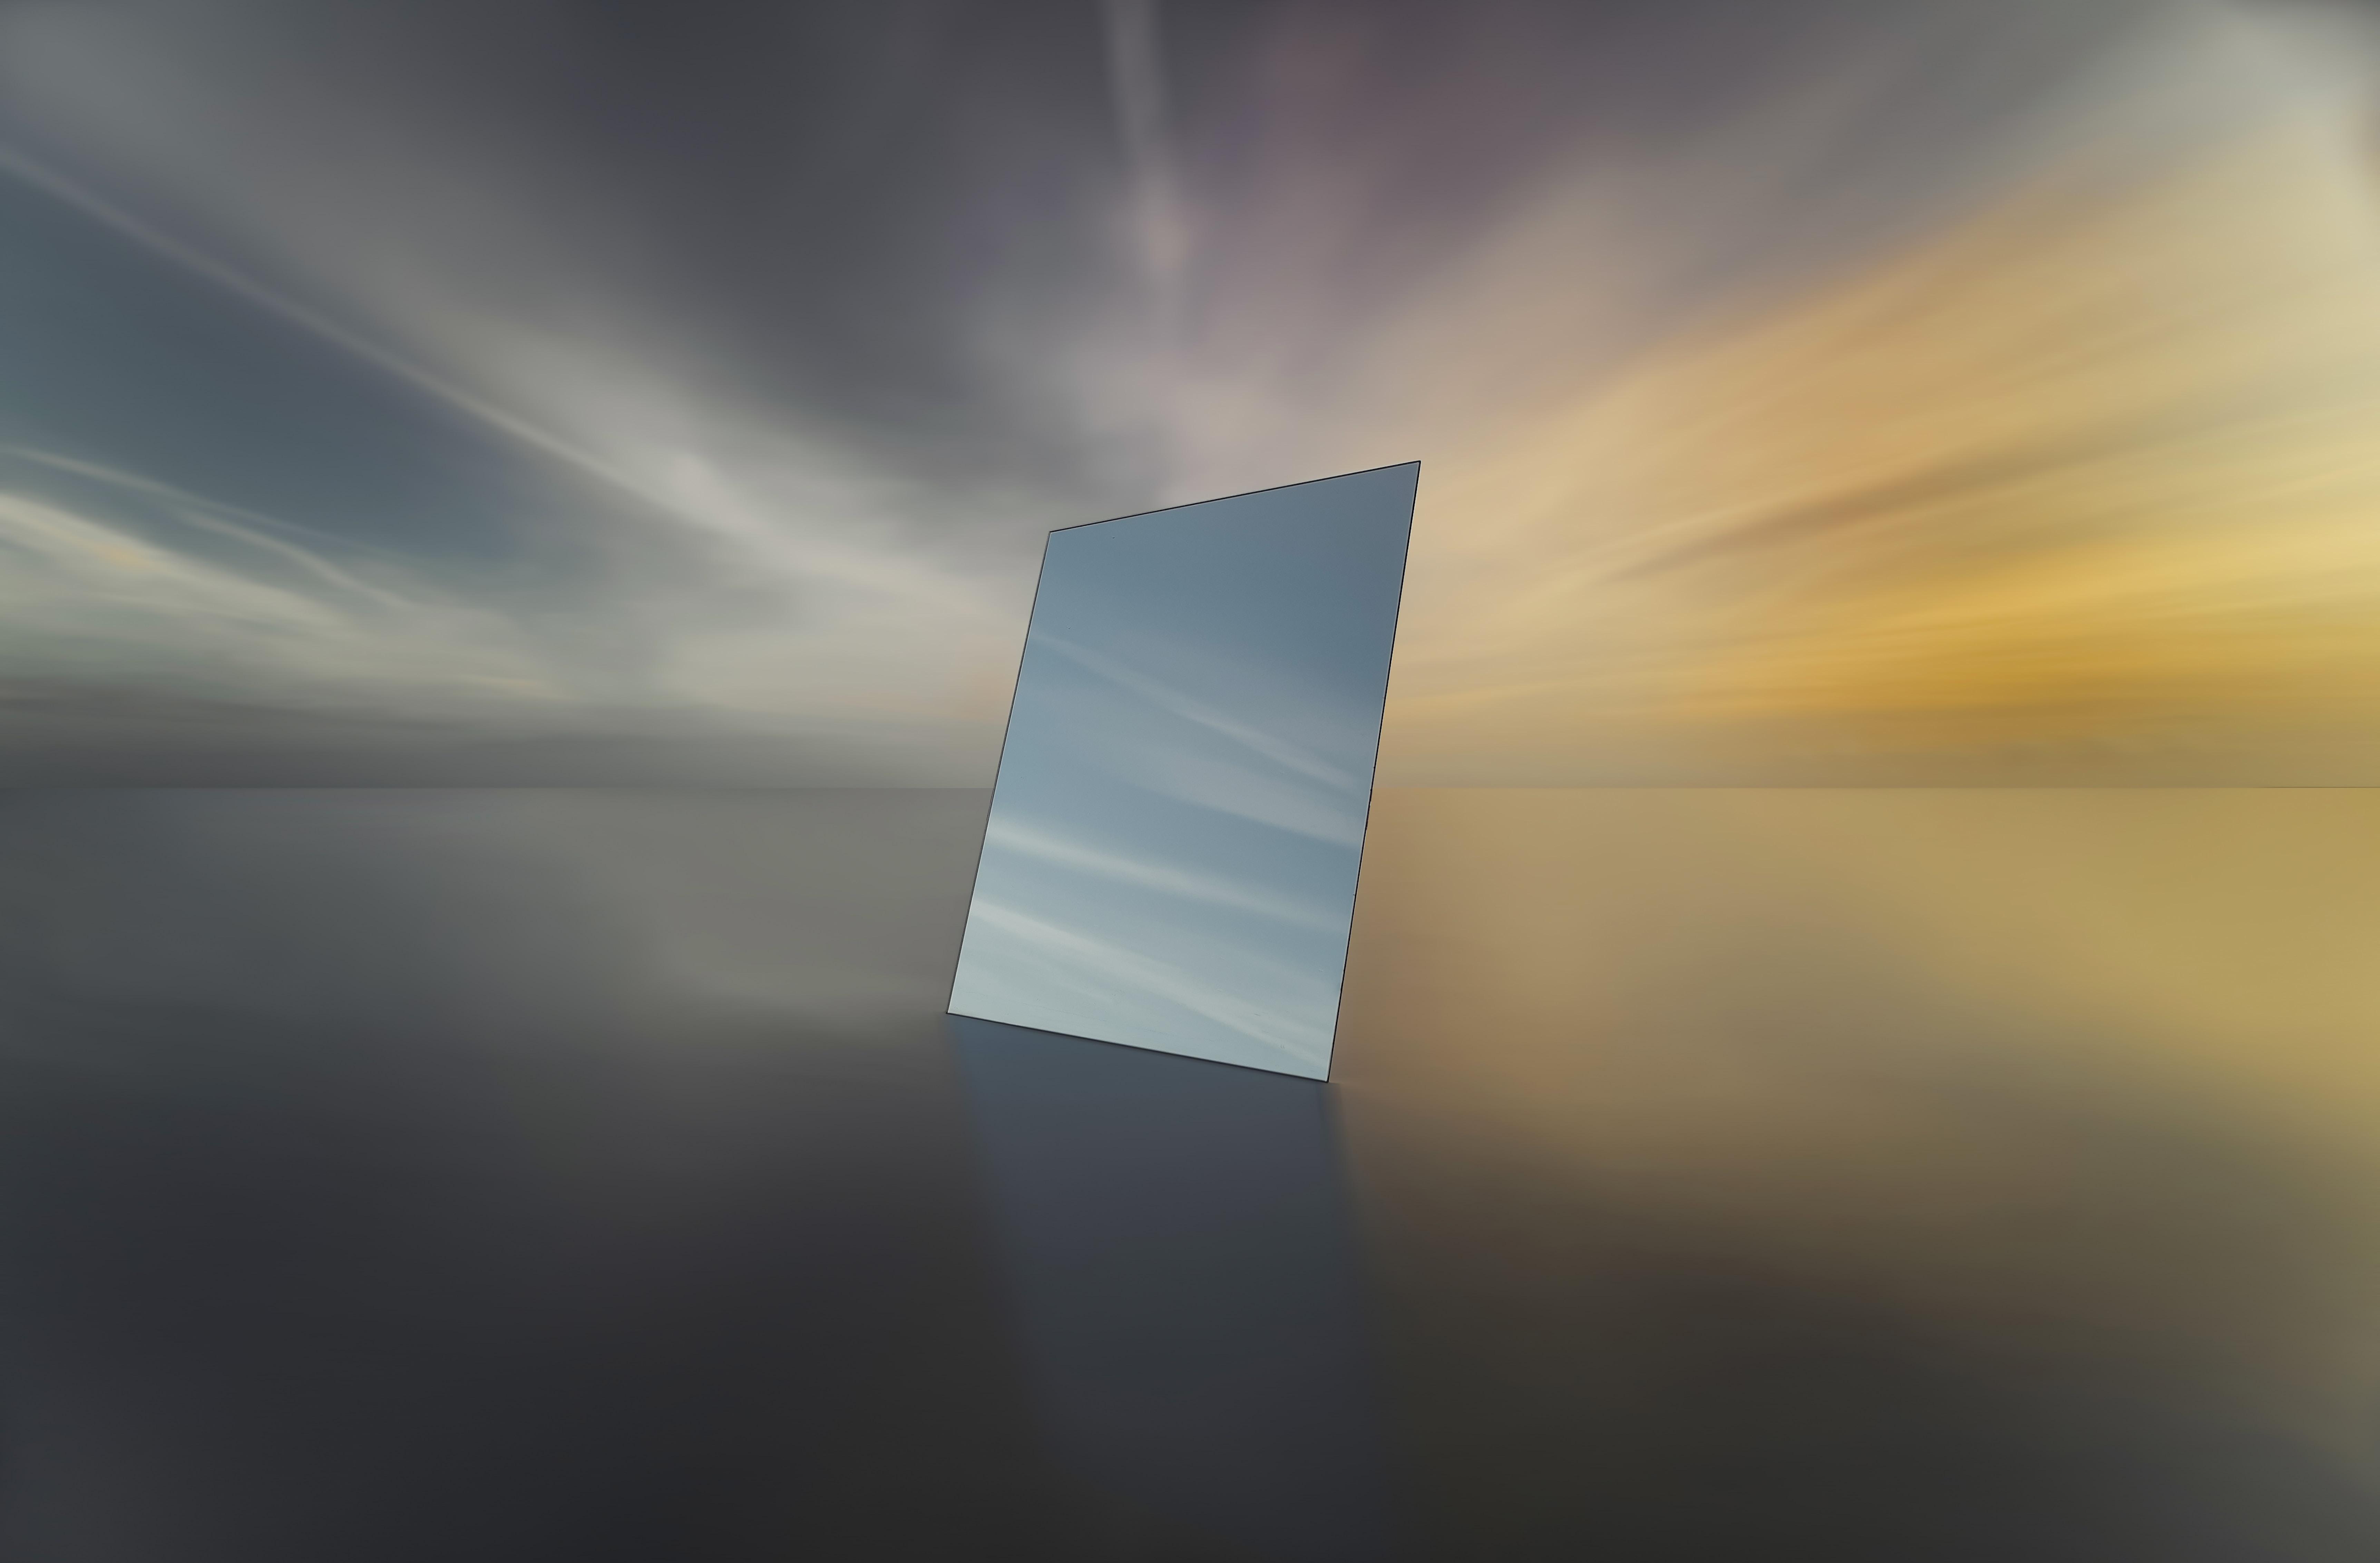 square mirror illustration